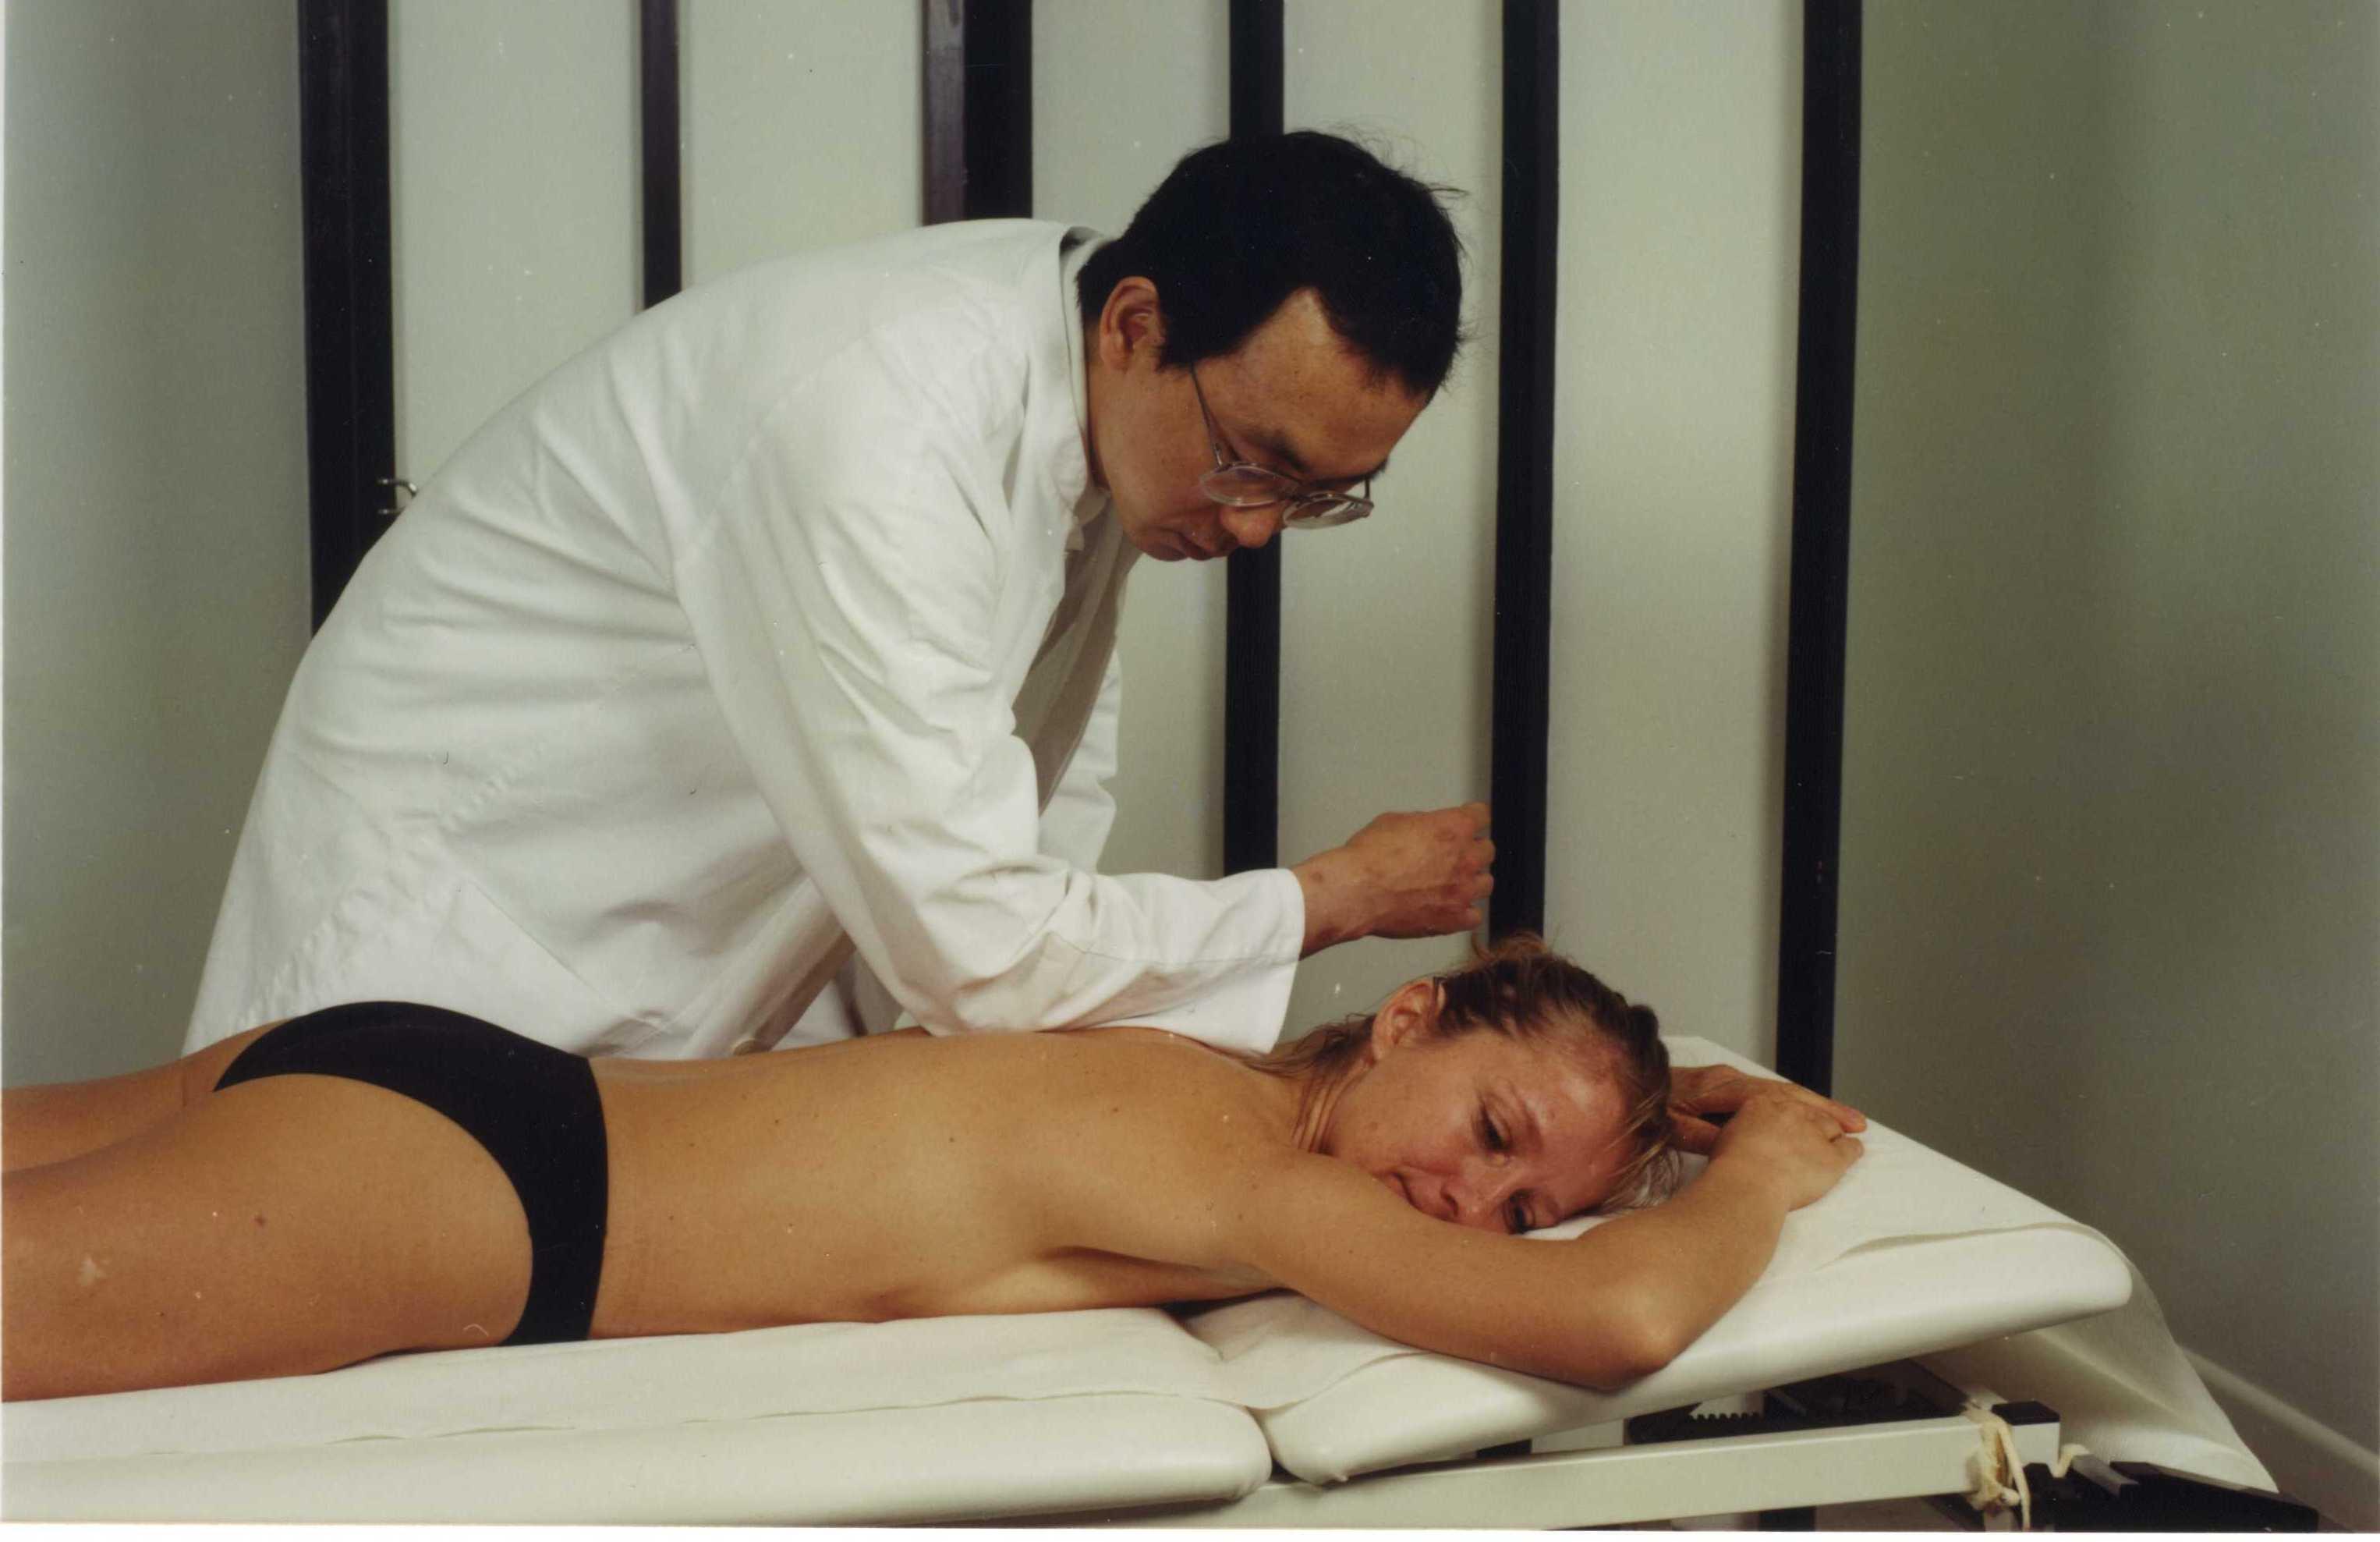 Blutenlassen an den Verbindungsgefäßen bei akuten und chronischen Rückenschmerzen